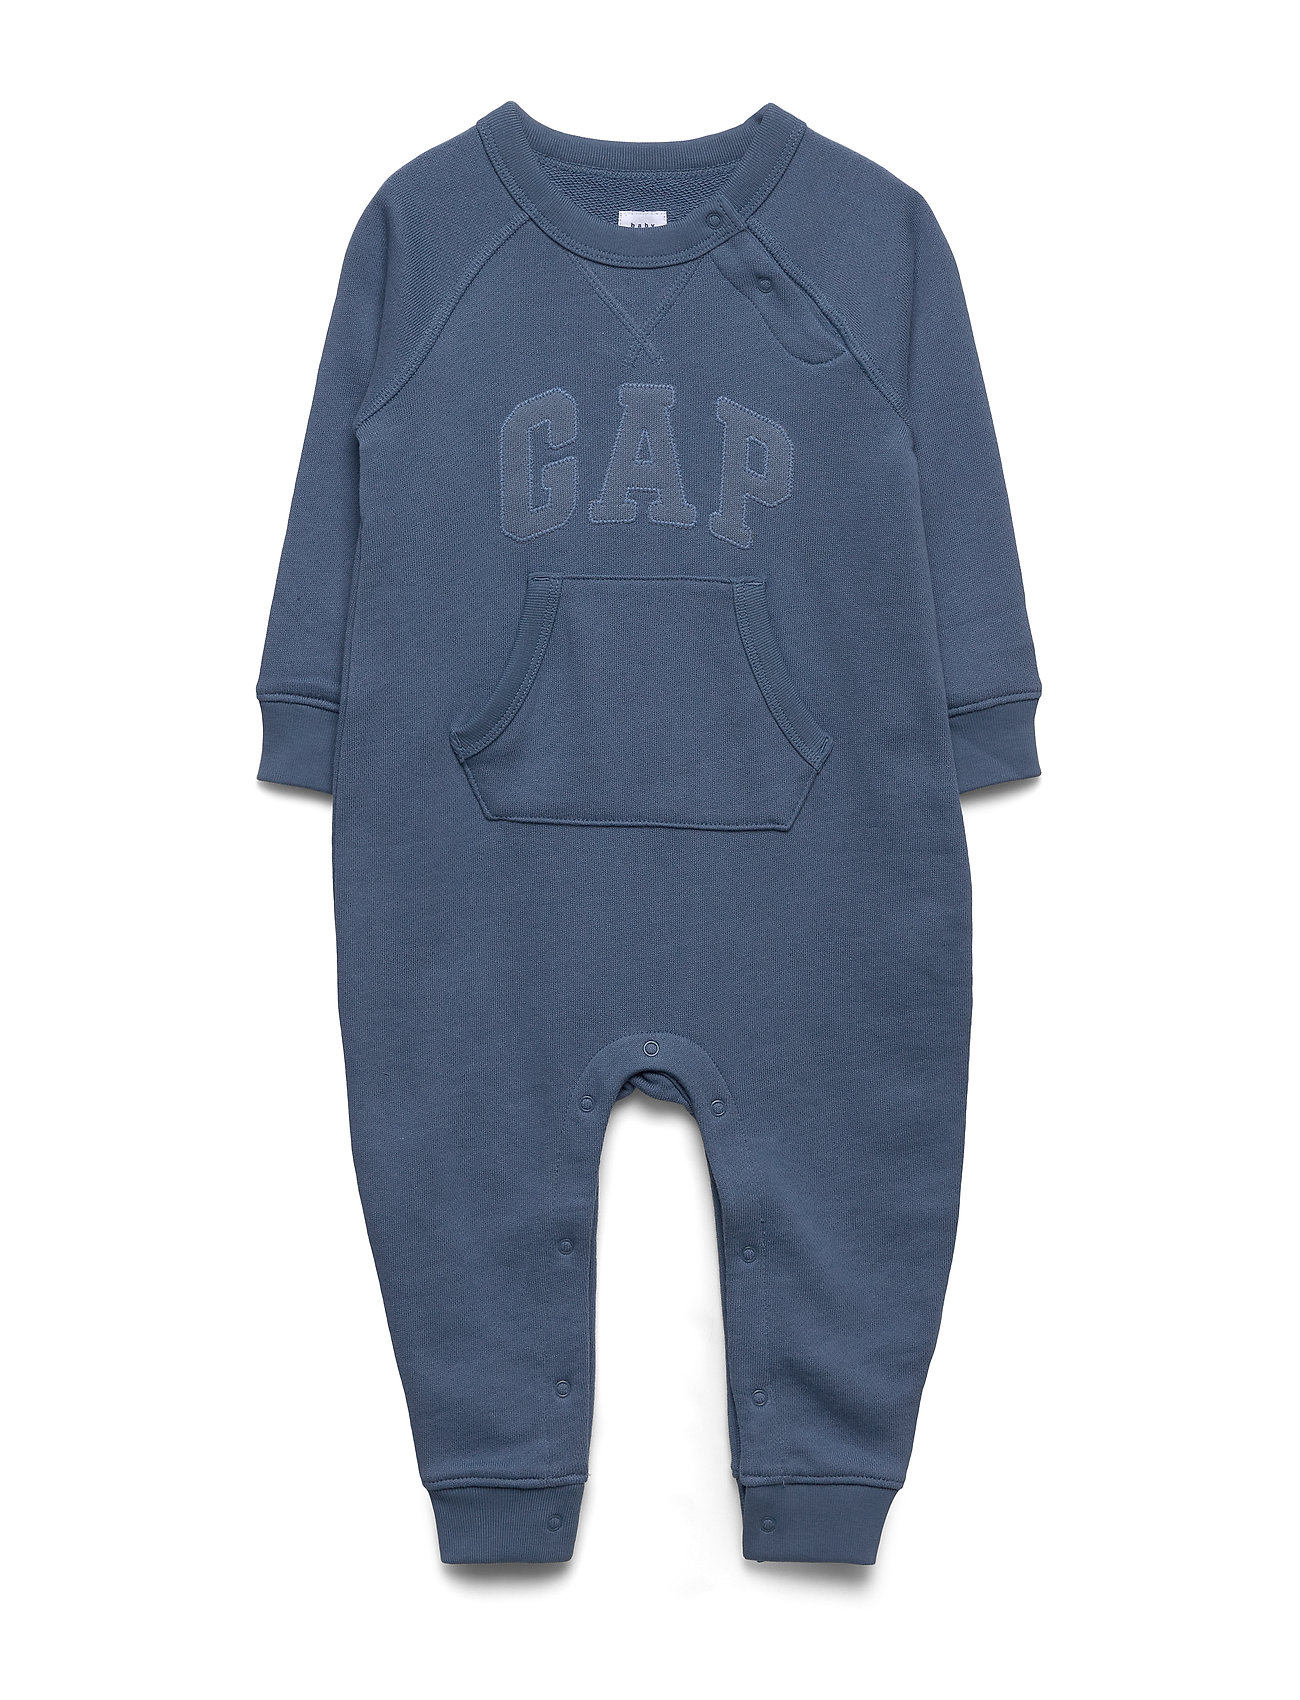 GAP GARCH FTLS 1PC - BAINBRIDGE BLUE